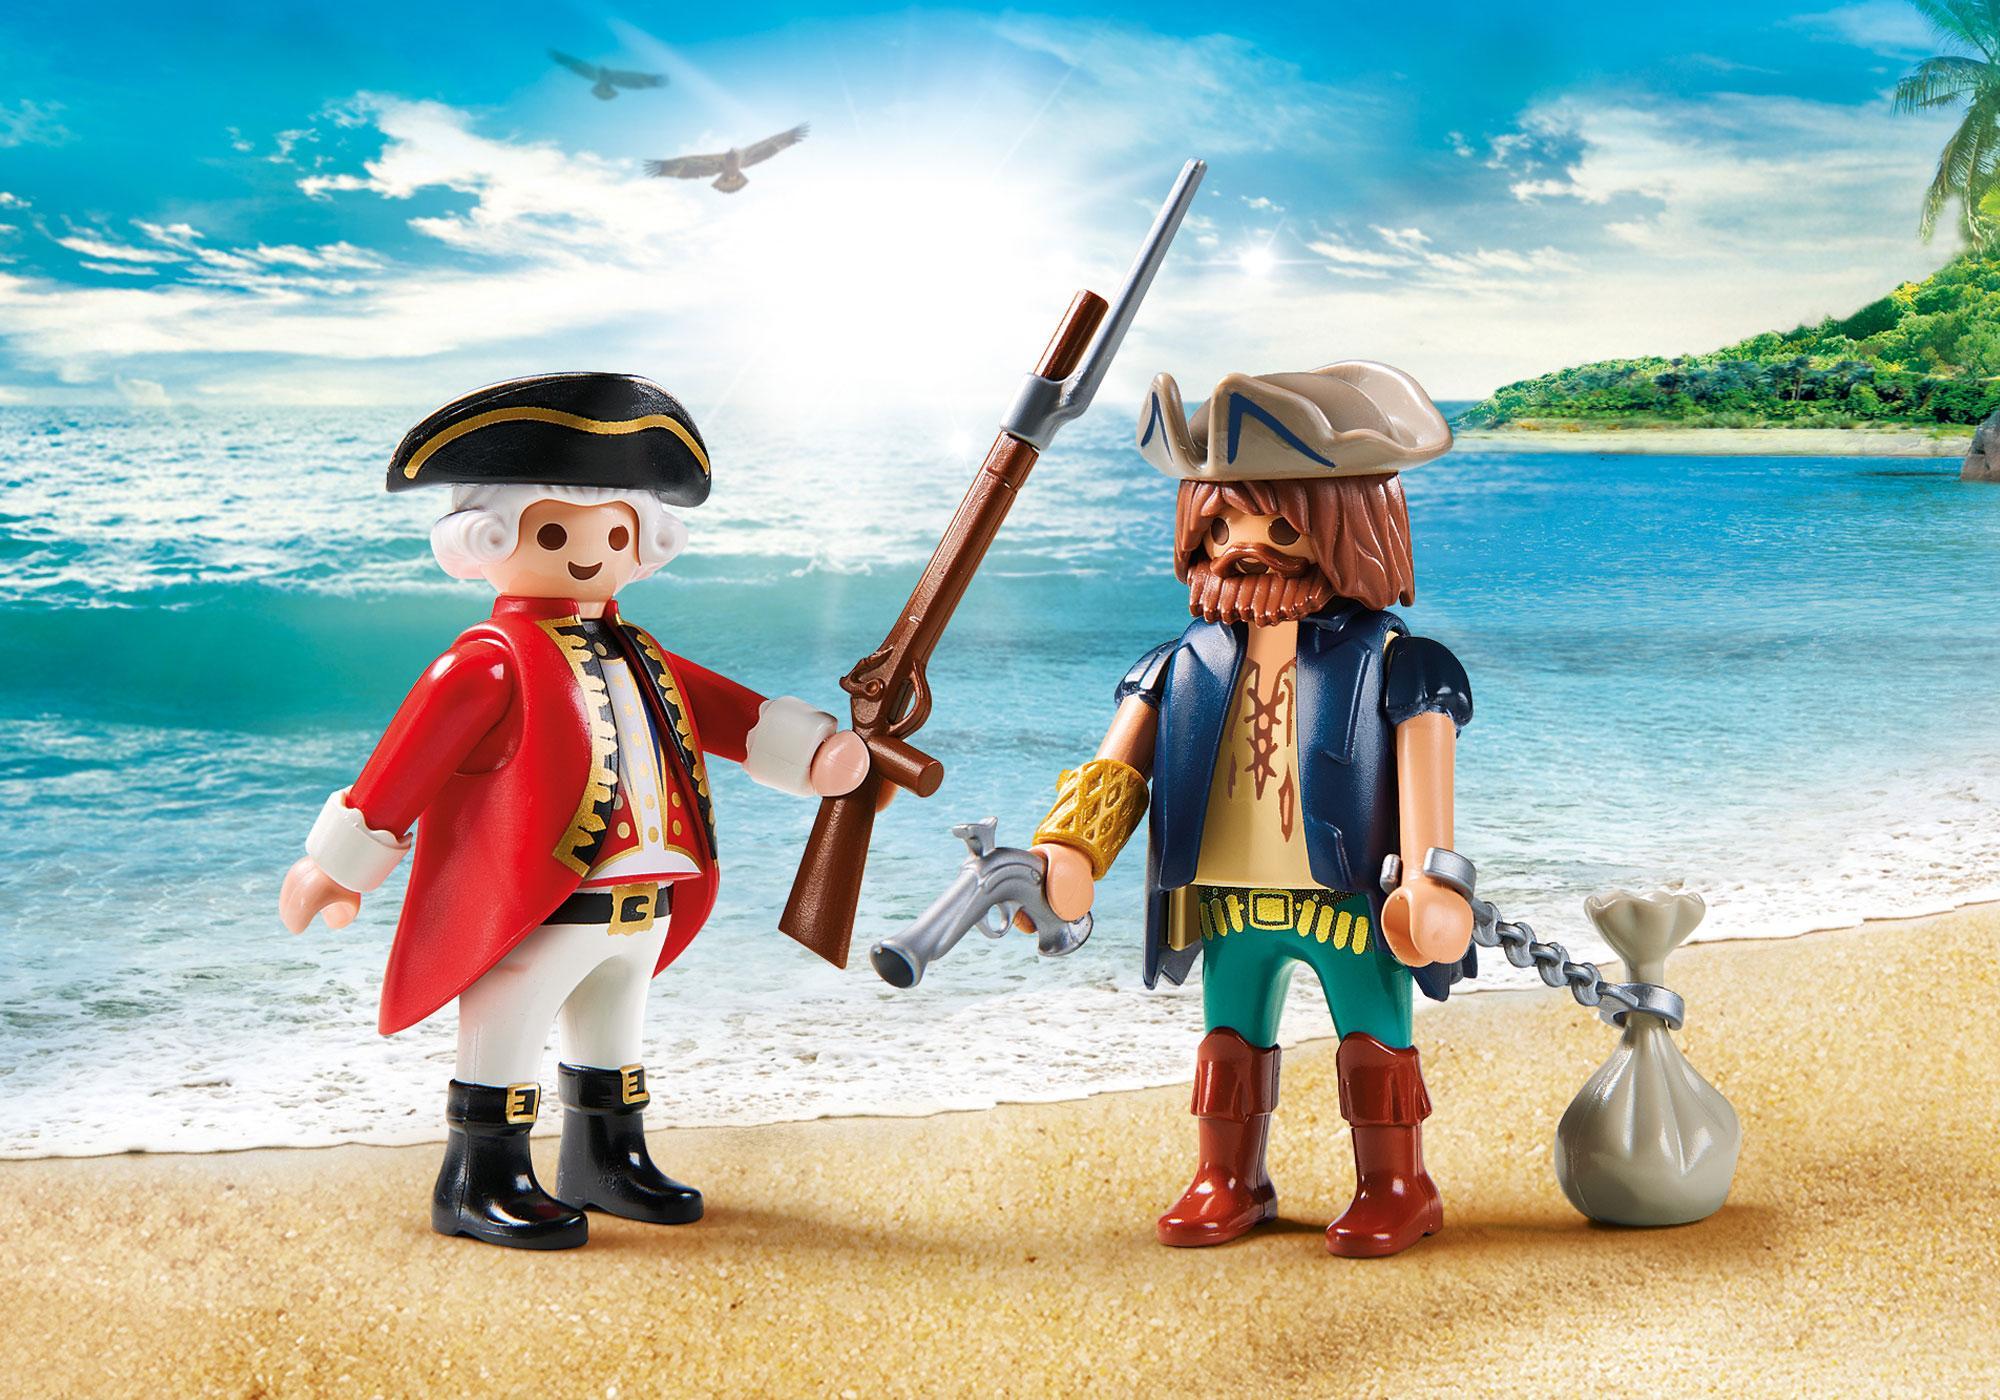 9446_product_detail/Duo Pack Pirat und Soldat